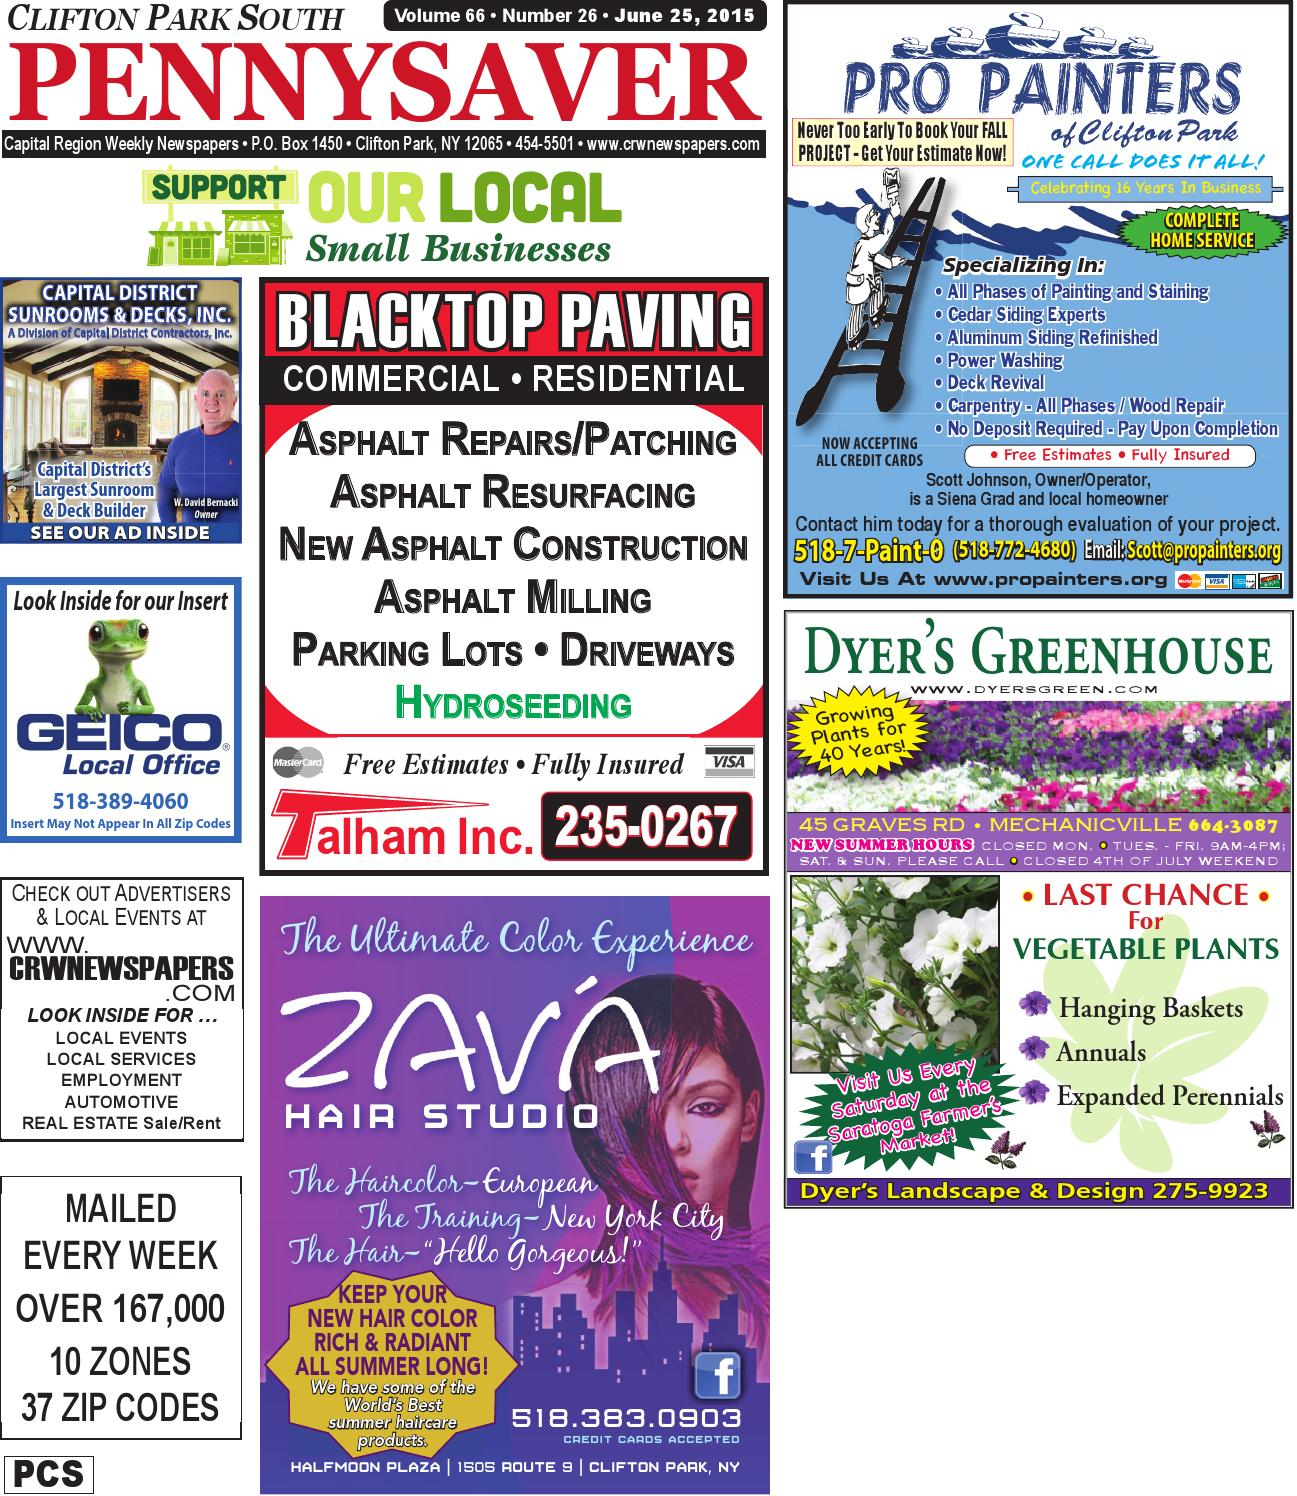 Clifton Park South Pennysaver 062515 By Capital Region